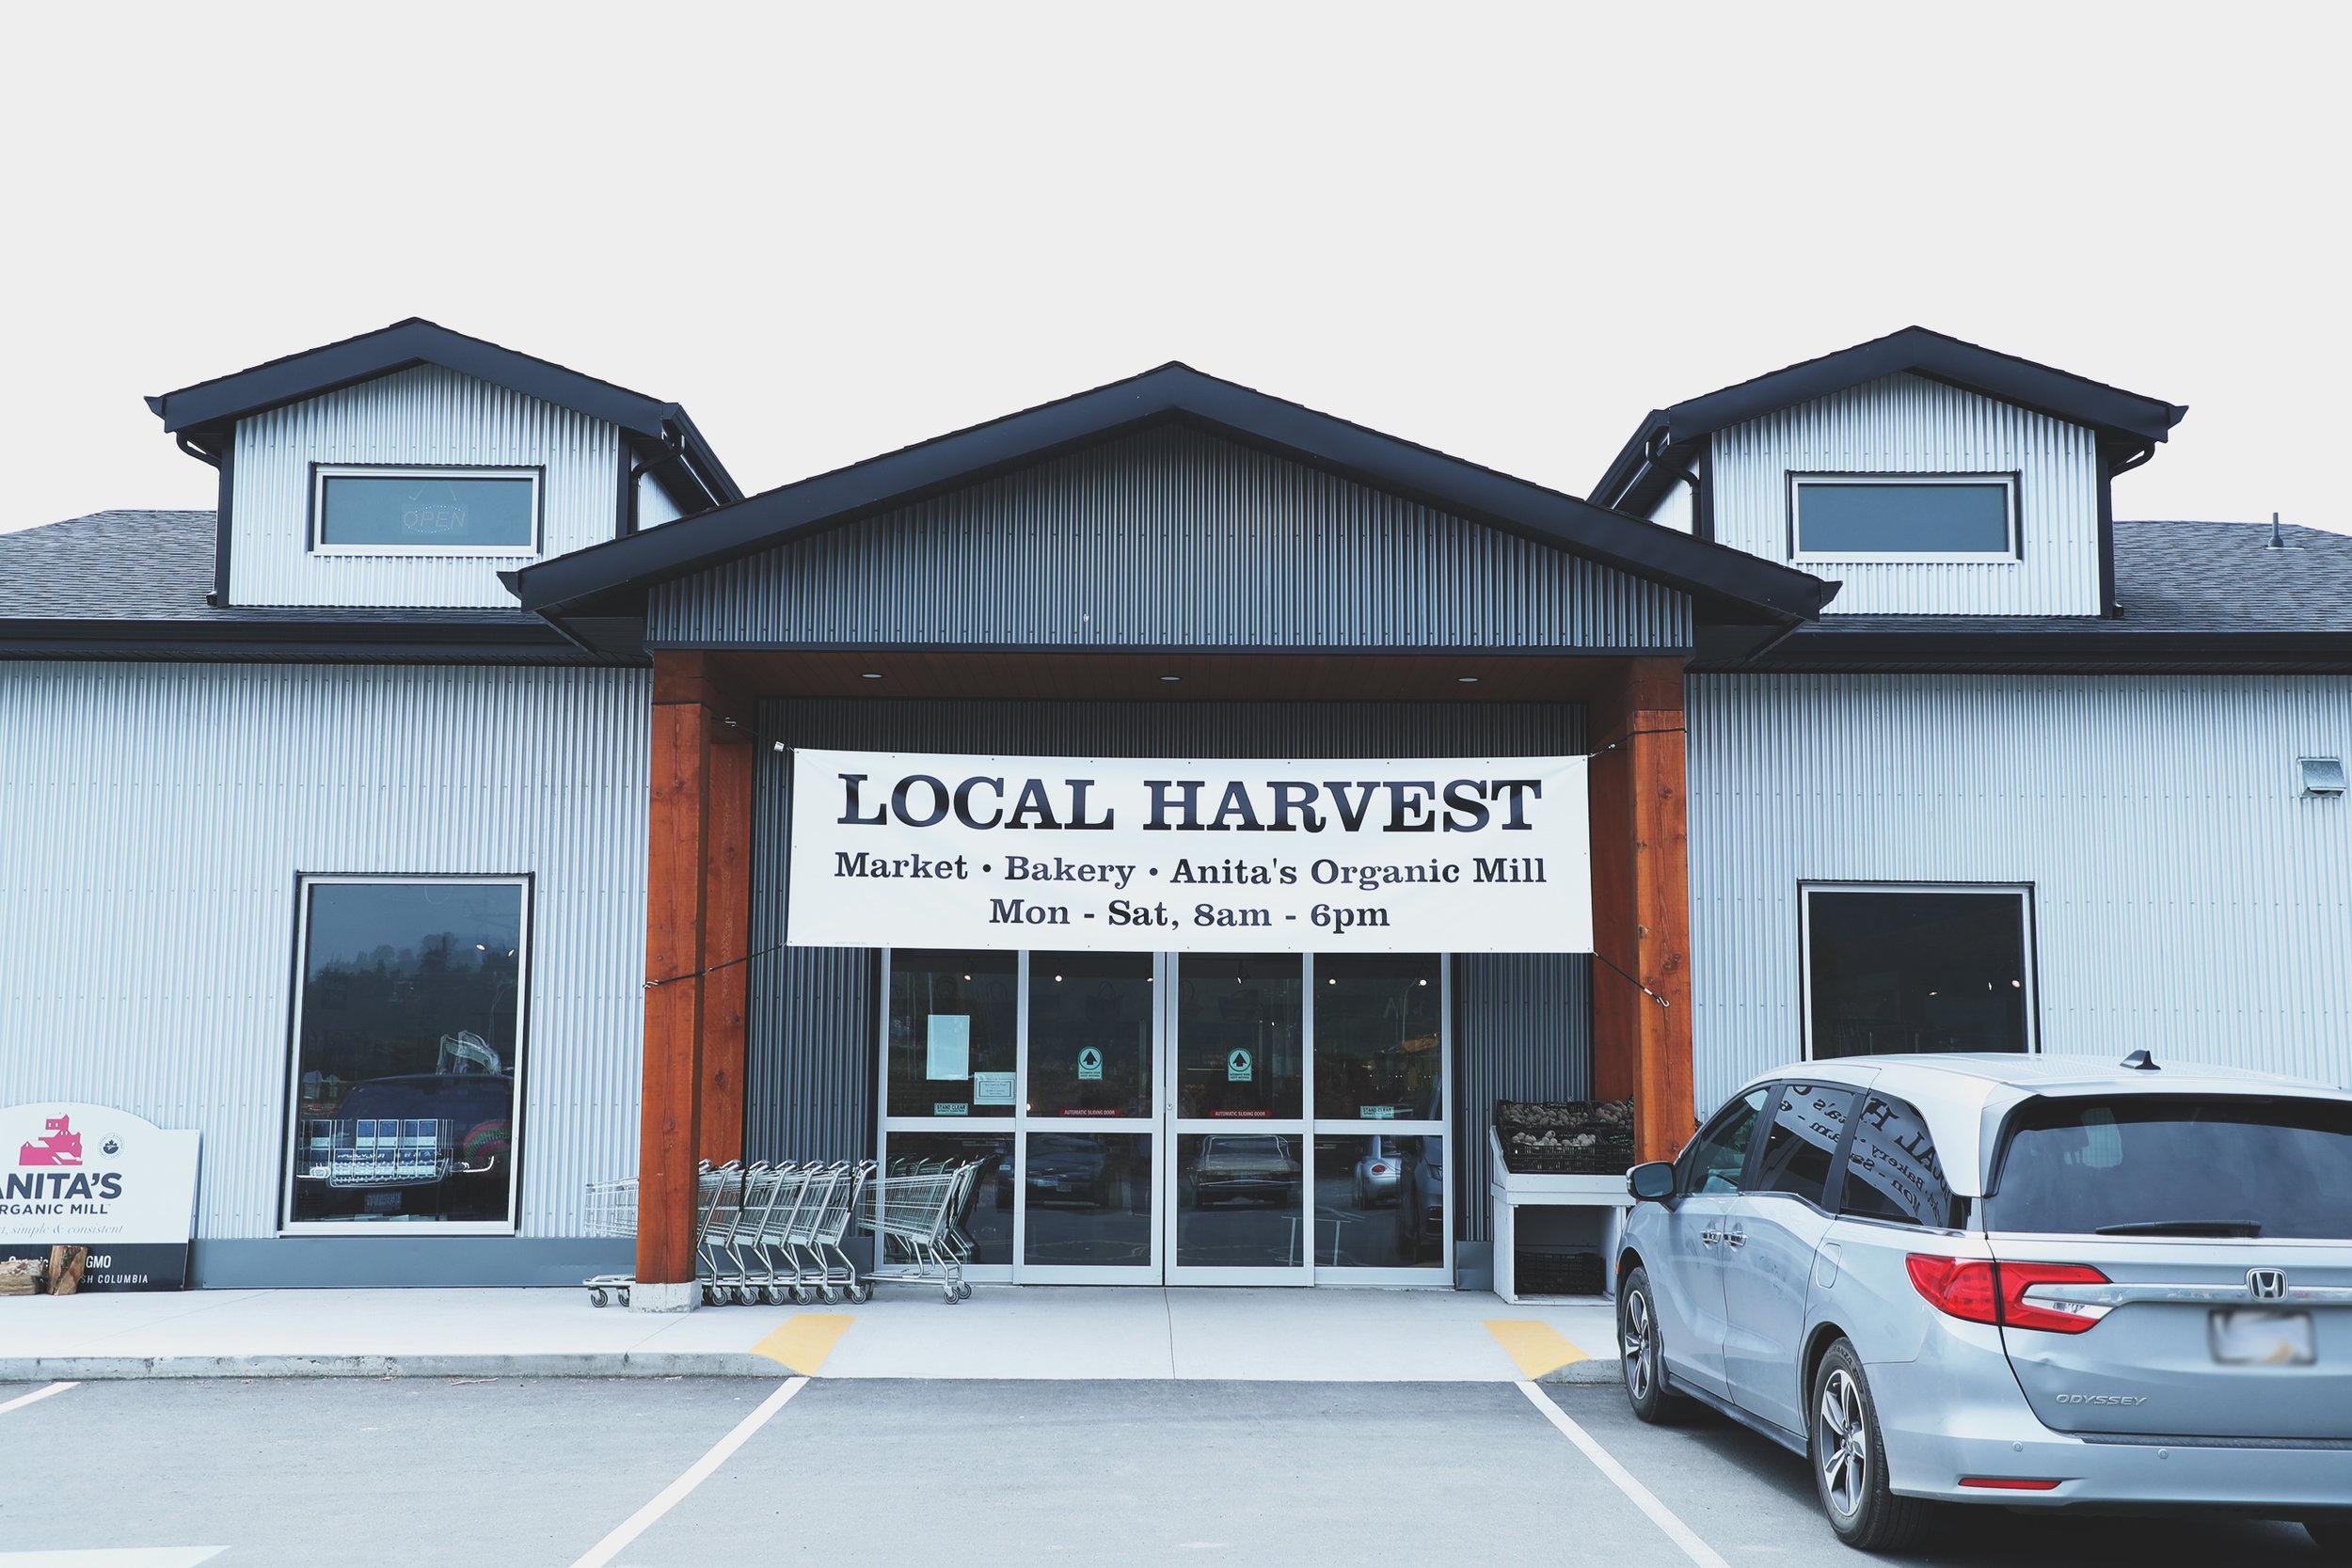 Local-Harvest-9.jpg